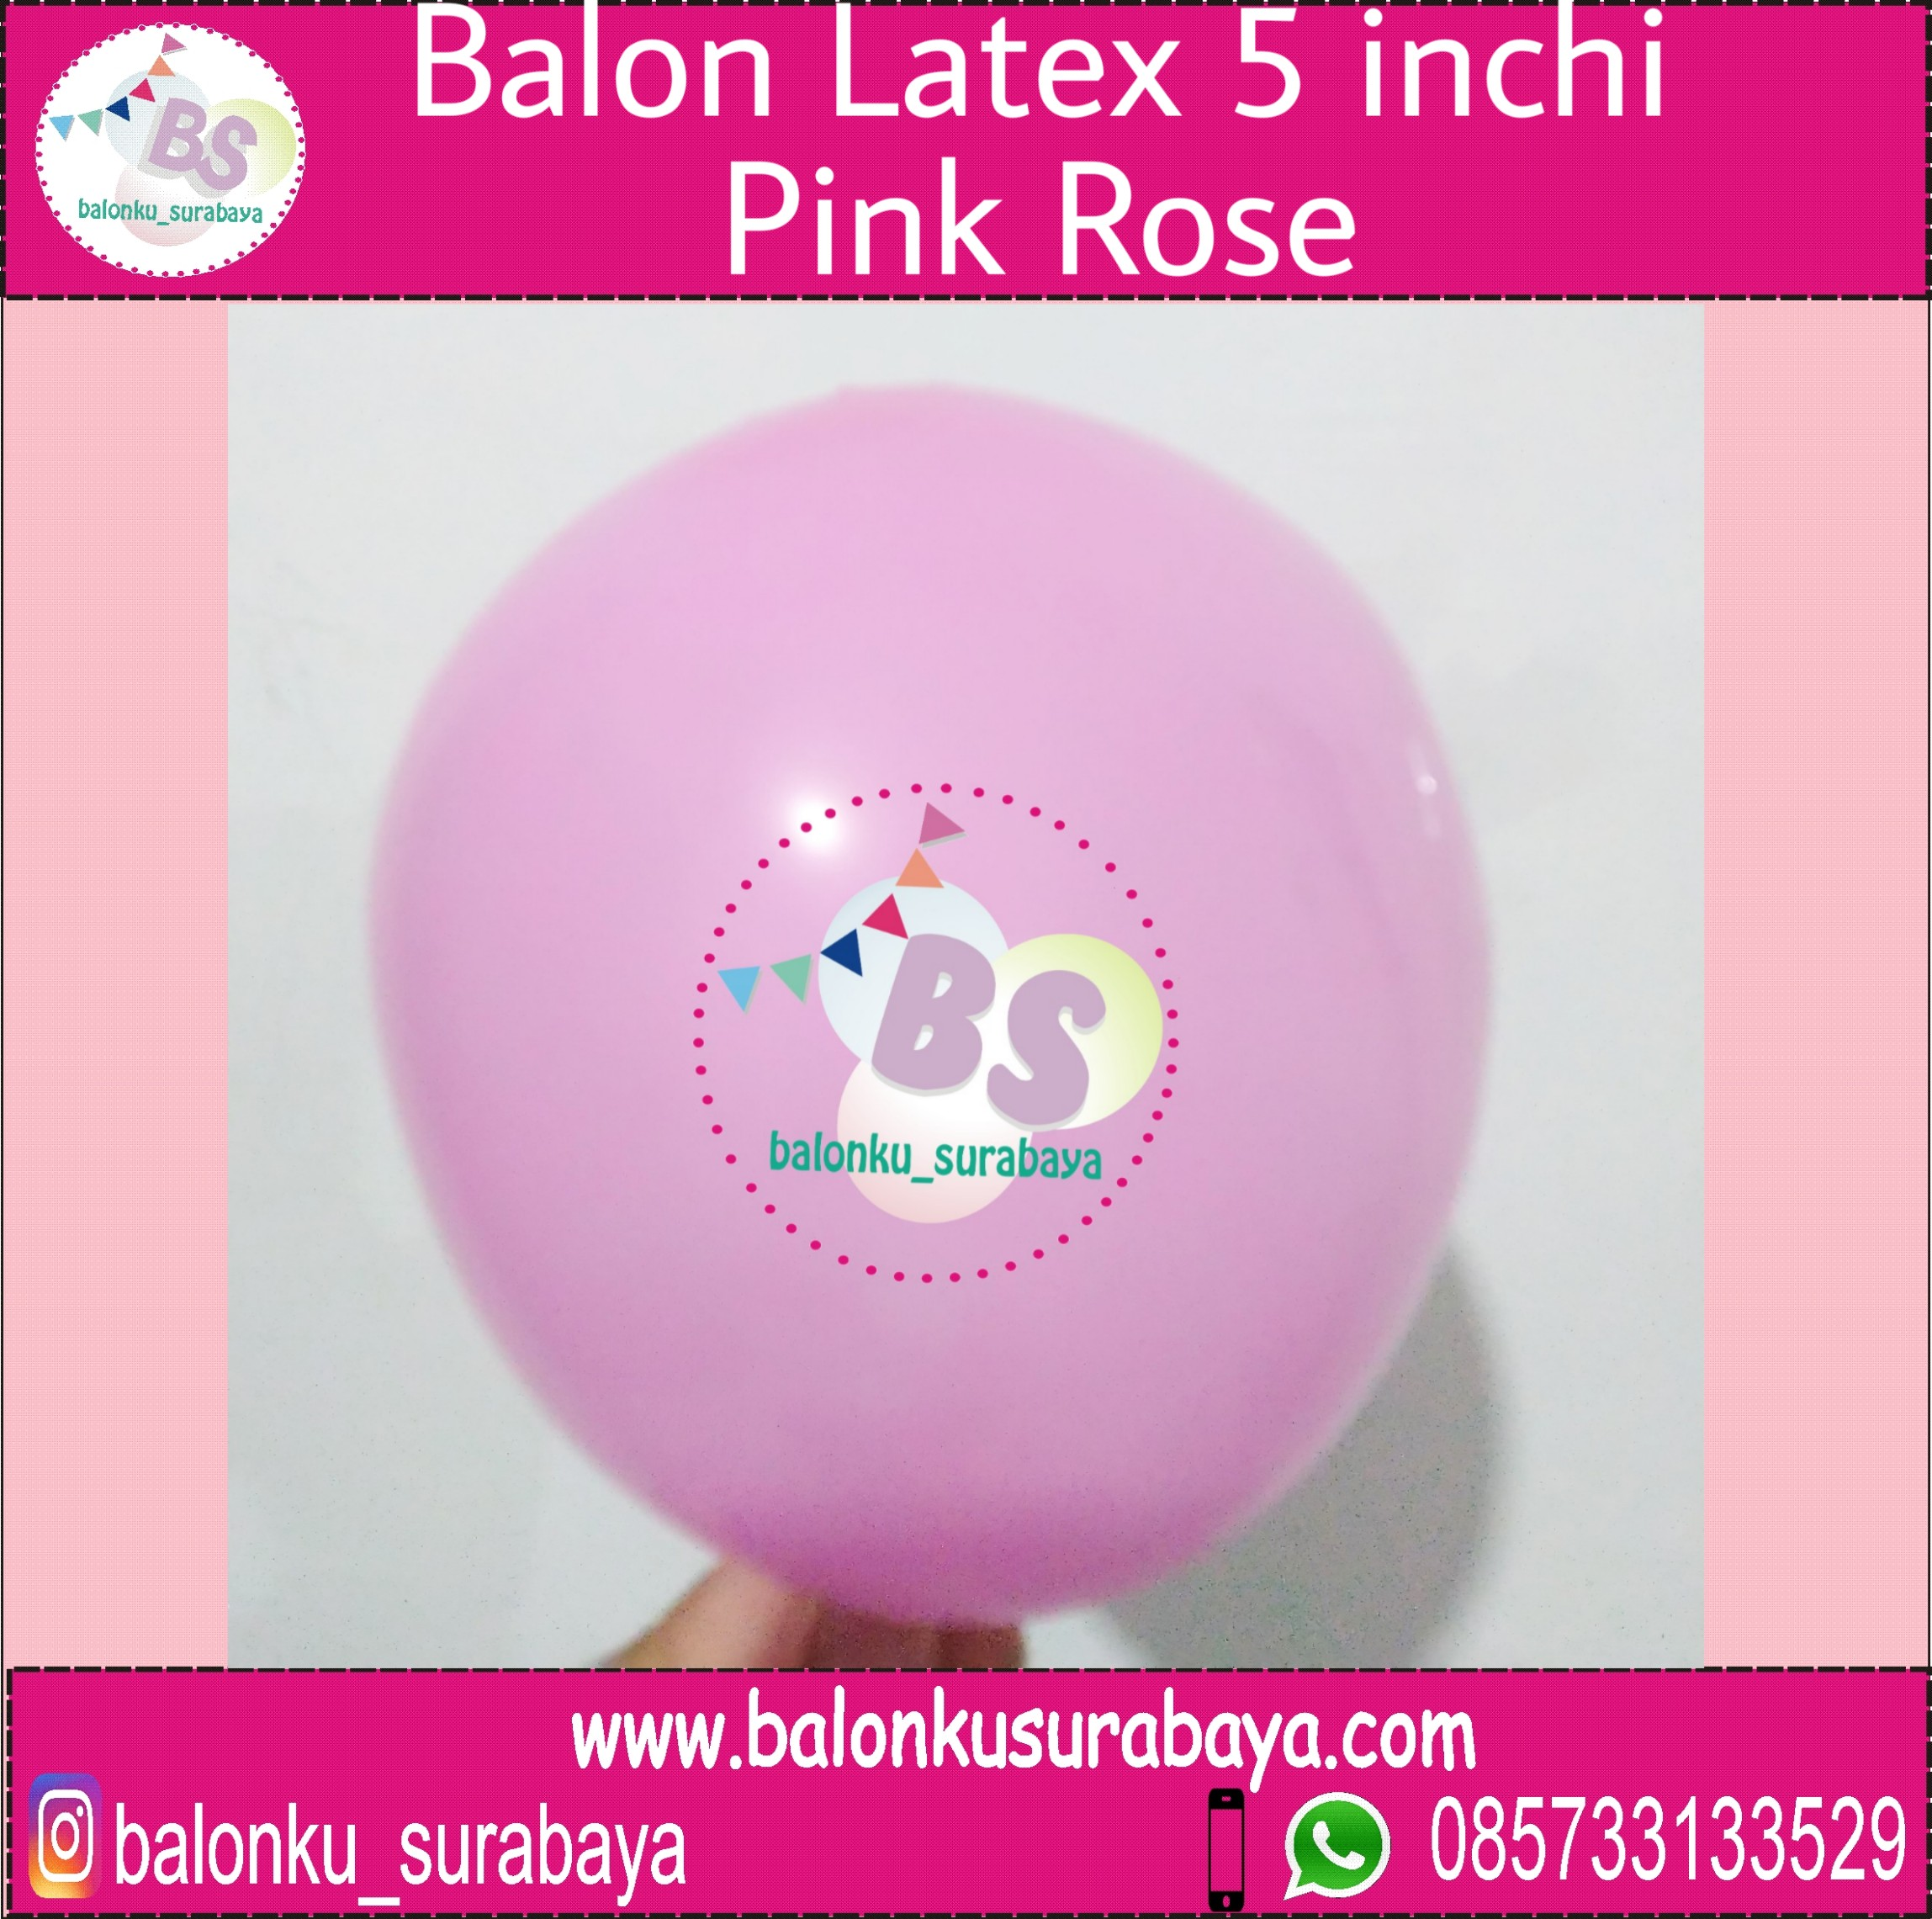 jual balon latex 5 inch pink rose, BAlon Gas,Bunga dekorasi,Rangkaian bunga artificial, Buket bunga, buket bunga mawar, harga buket bunga,Balon sablon, balon Printing, balon promosi, , Perlengkapan ulang tahun, Balon latex , balon doff, balon latex, balon doff merah, balon natal, balon agustusan, balon dekorasi, balonku Surabaya, 085733133529